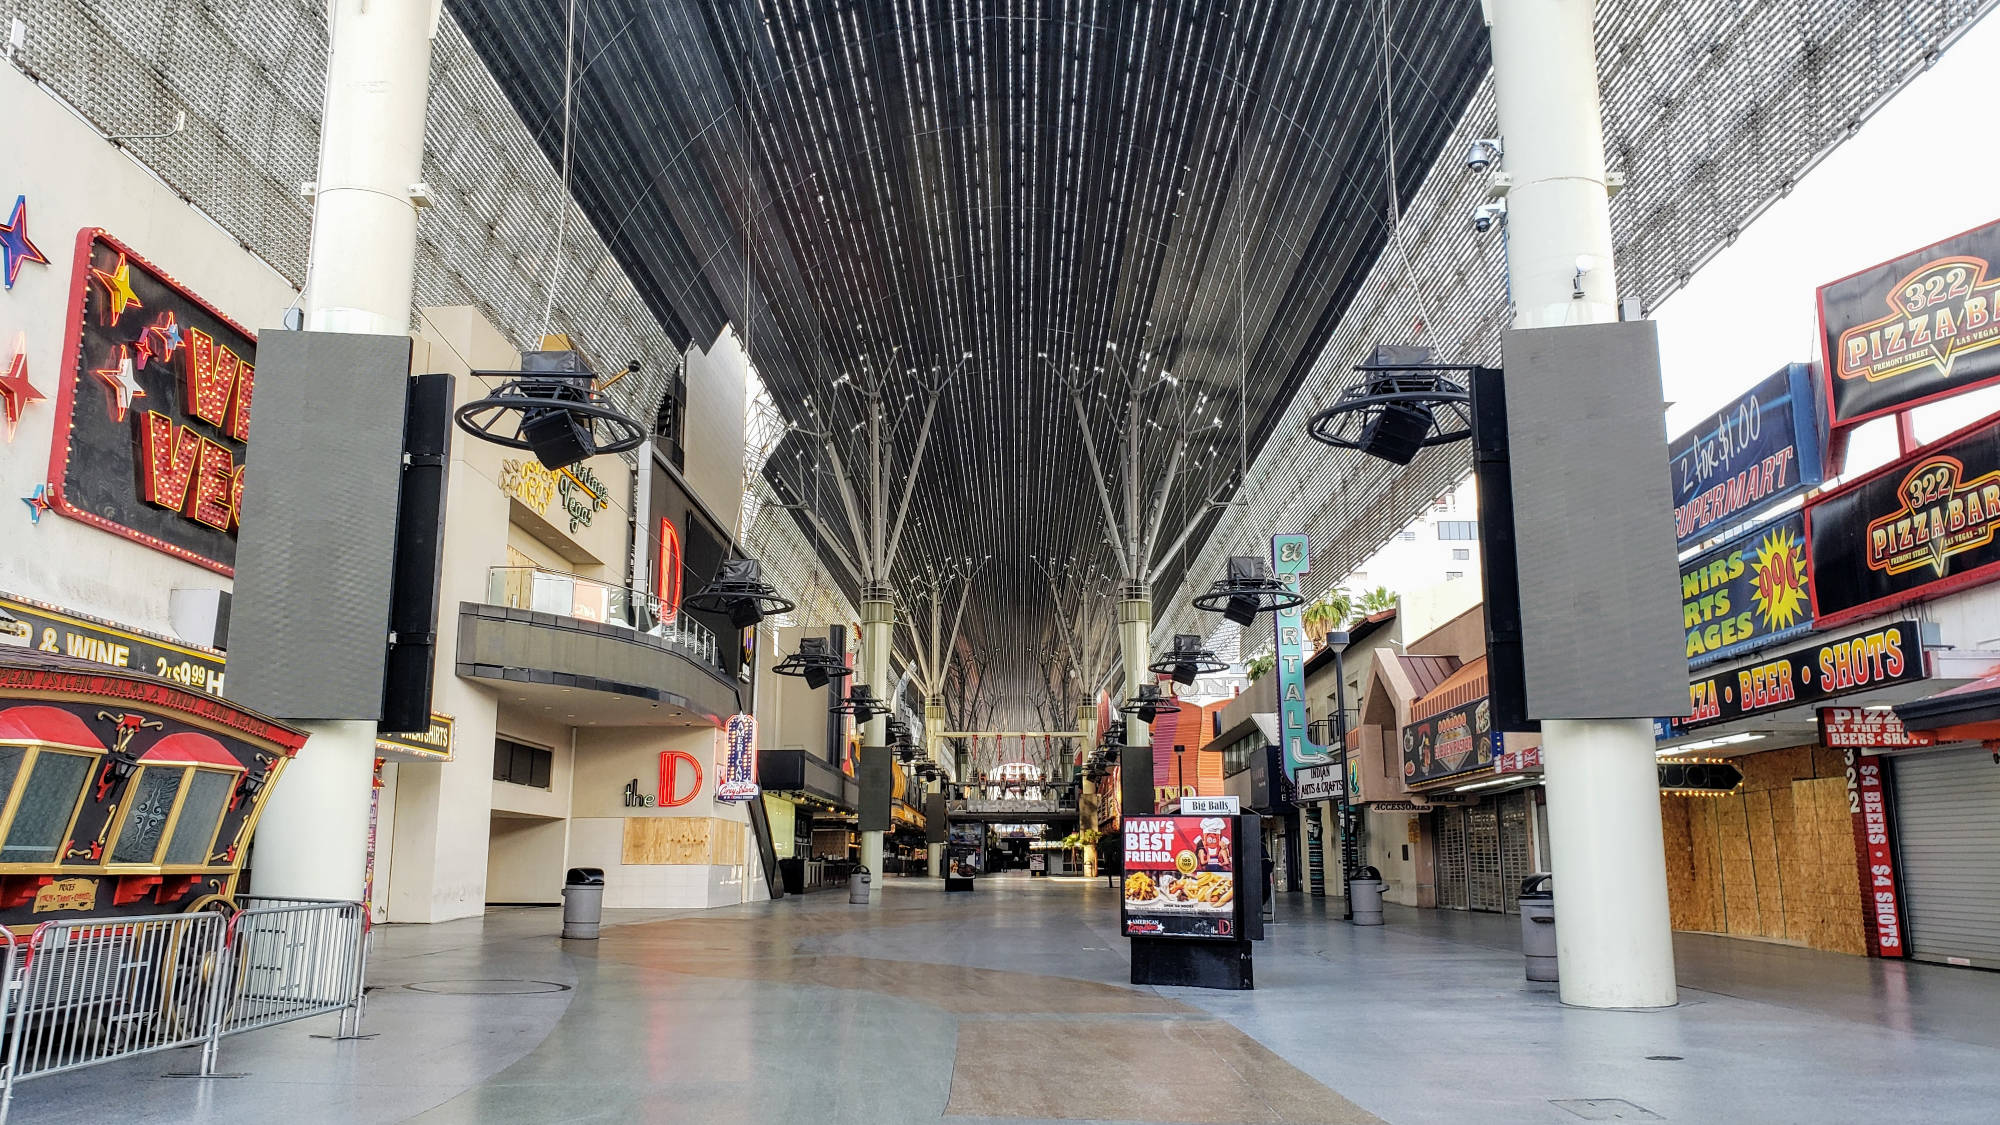 Fremont Street Las Vegas selama Penguncian Virus Corona